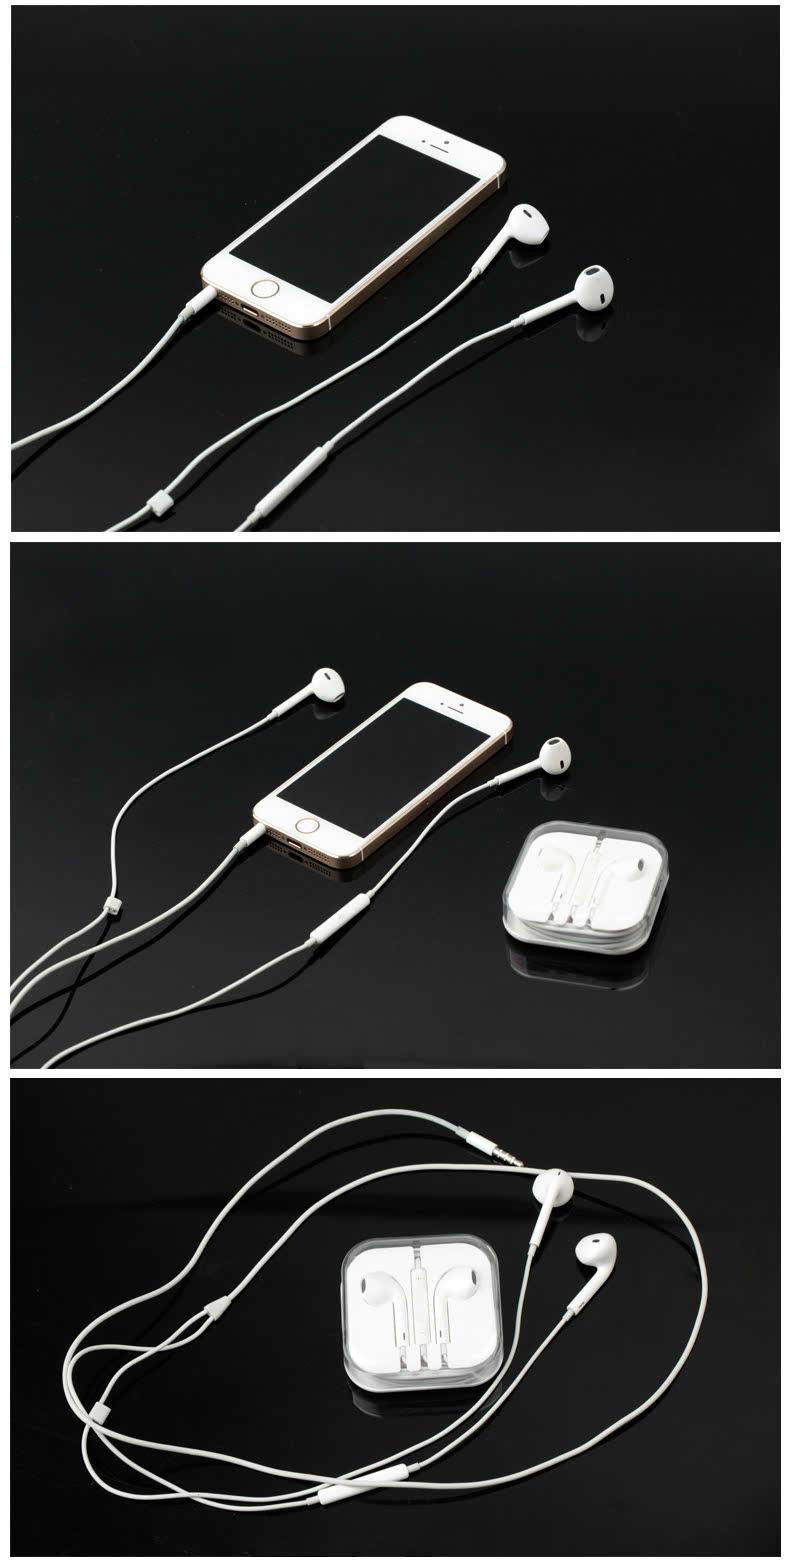 i-mu幻响手机苹果v手机入耳式线控聚砜医用用耳机设备图片